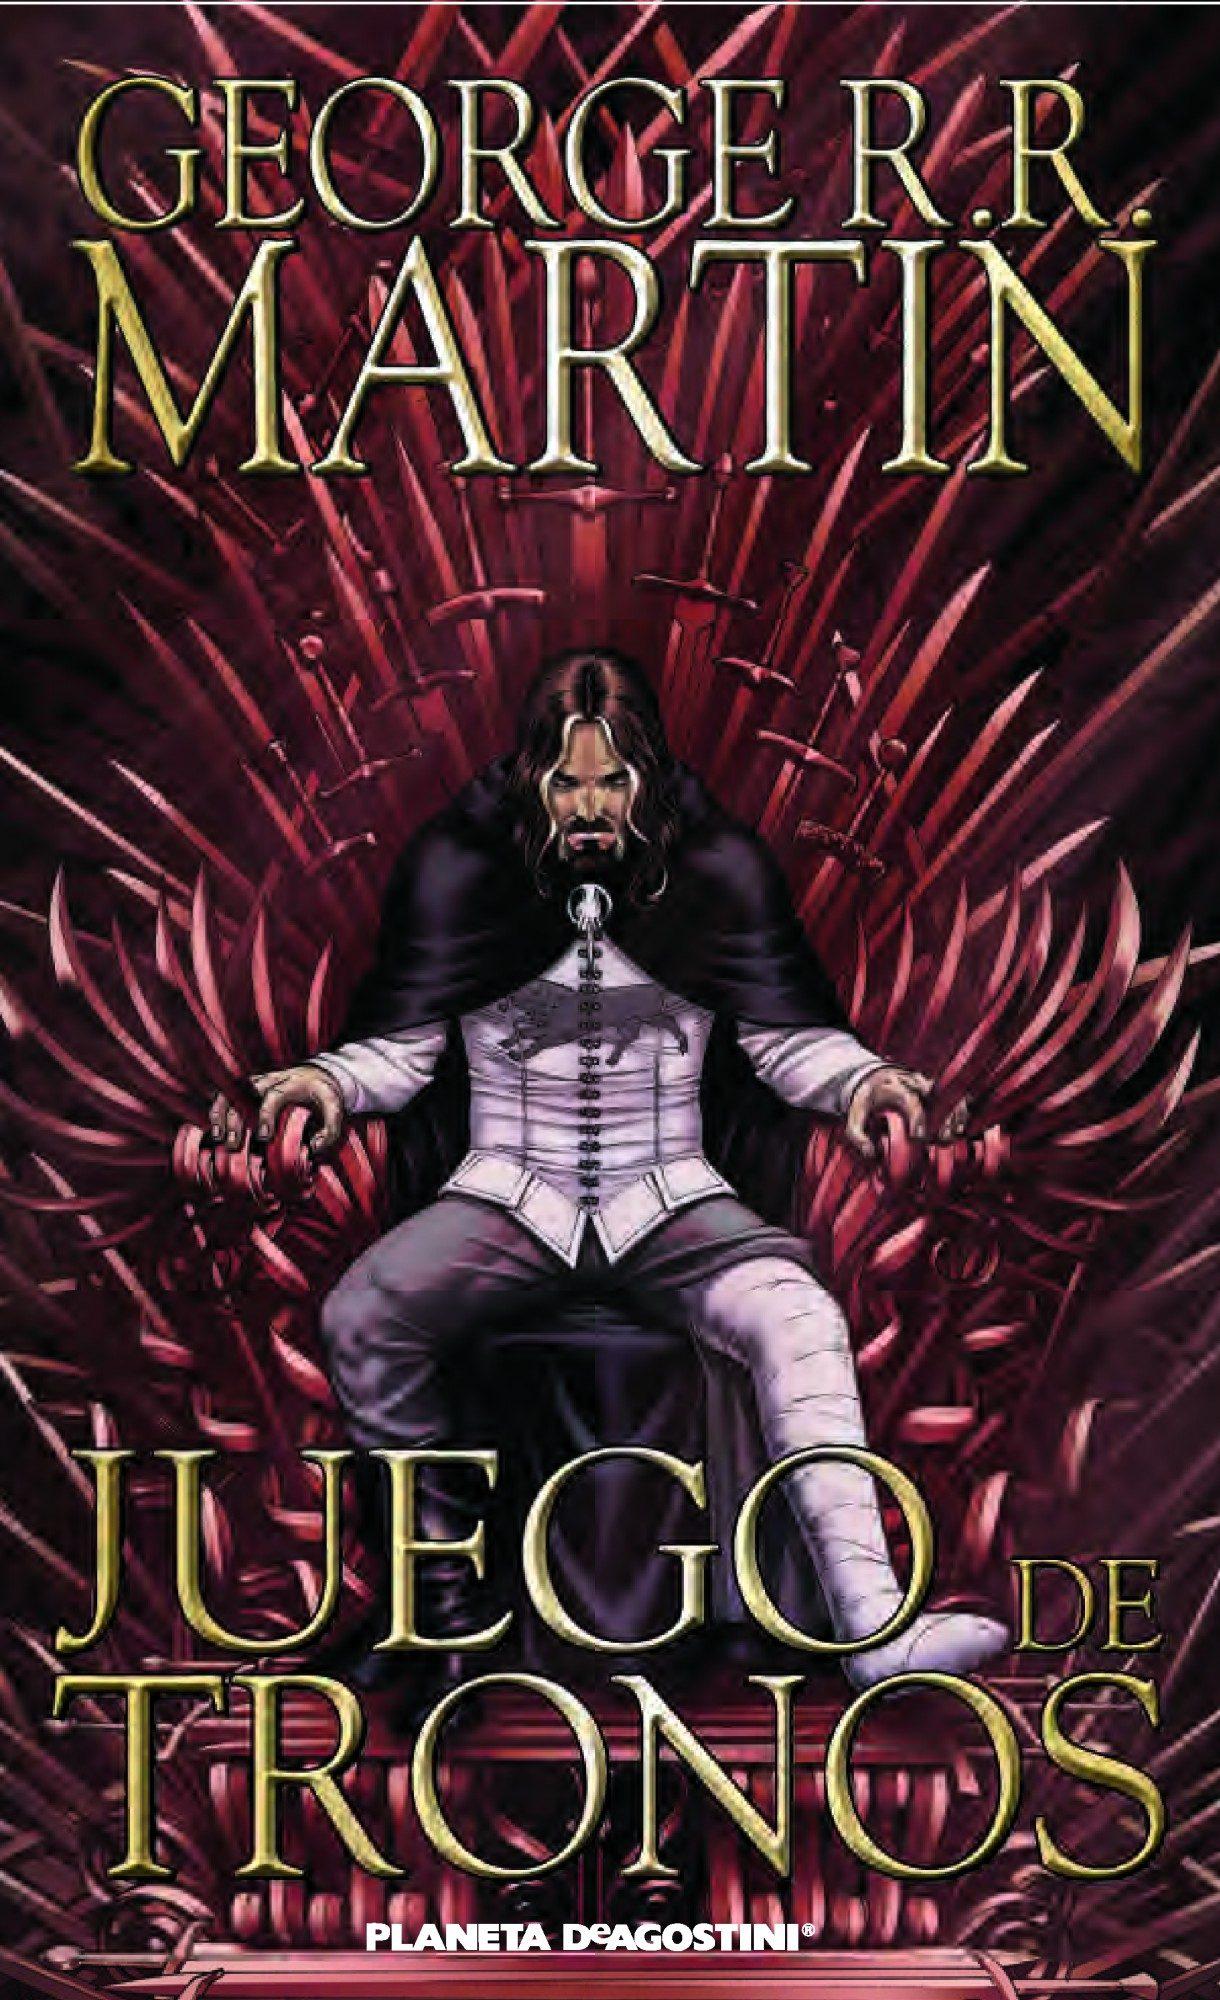 Juego de Tronos 3 - George R. R. Martin - Planeta Deagostini Cómics